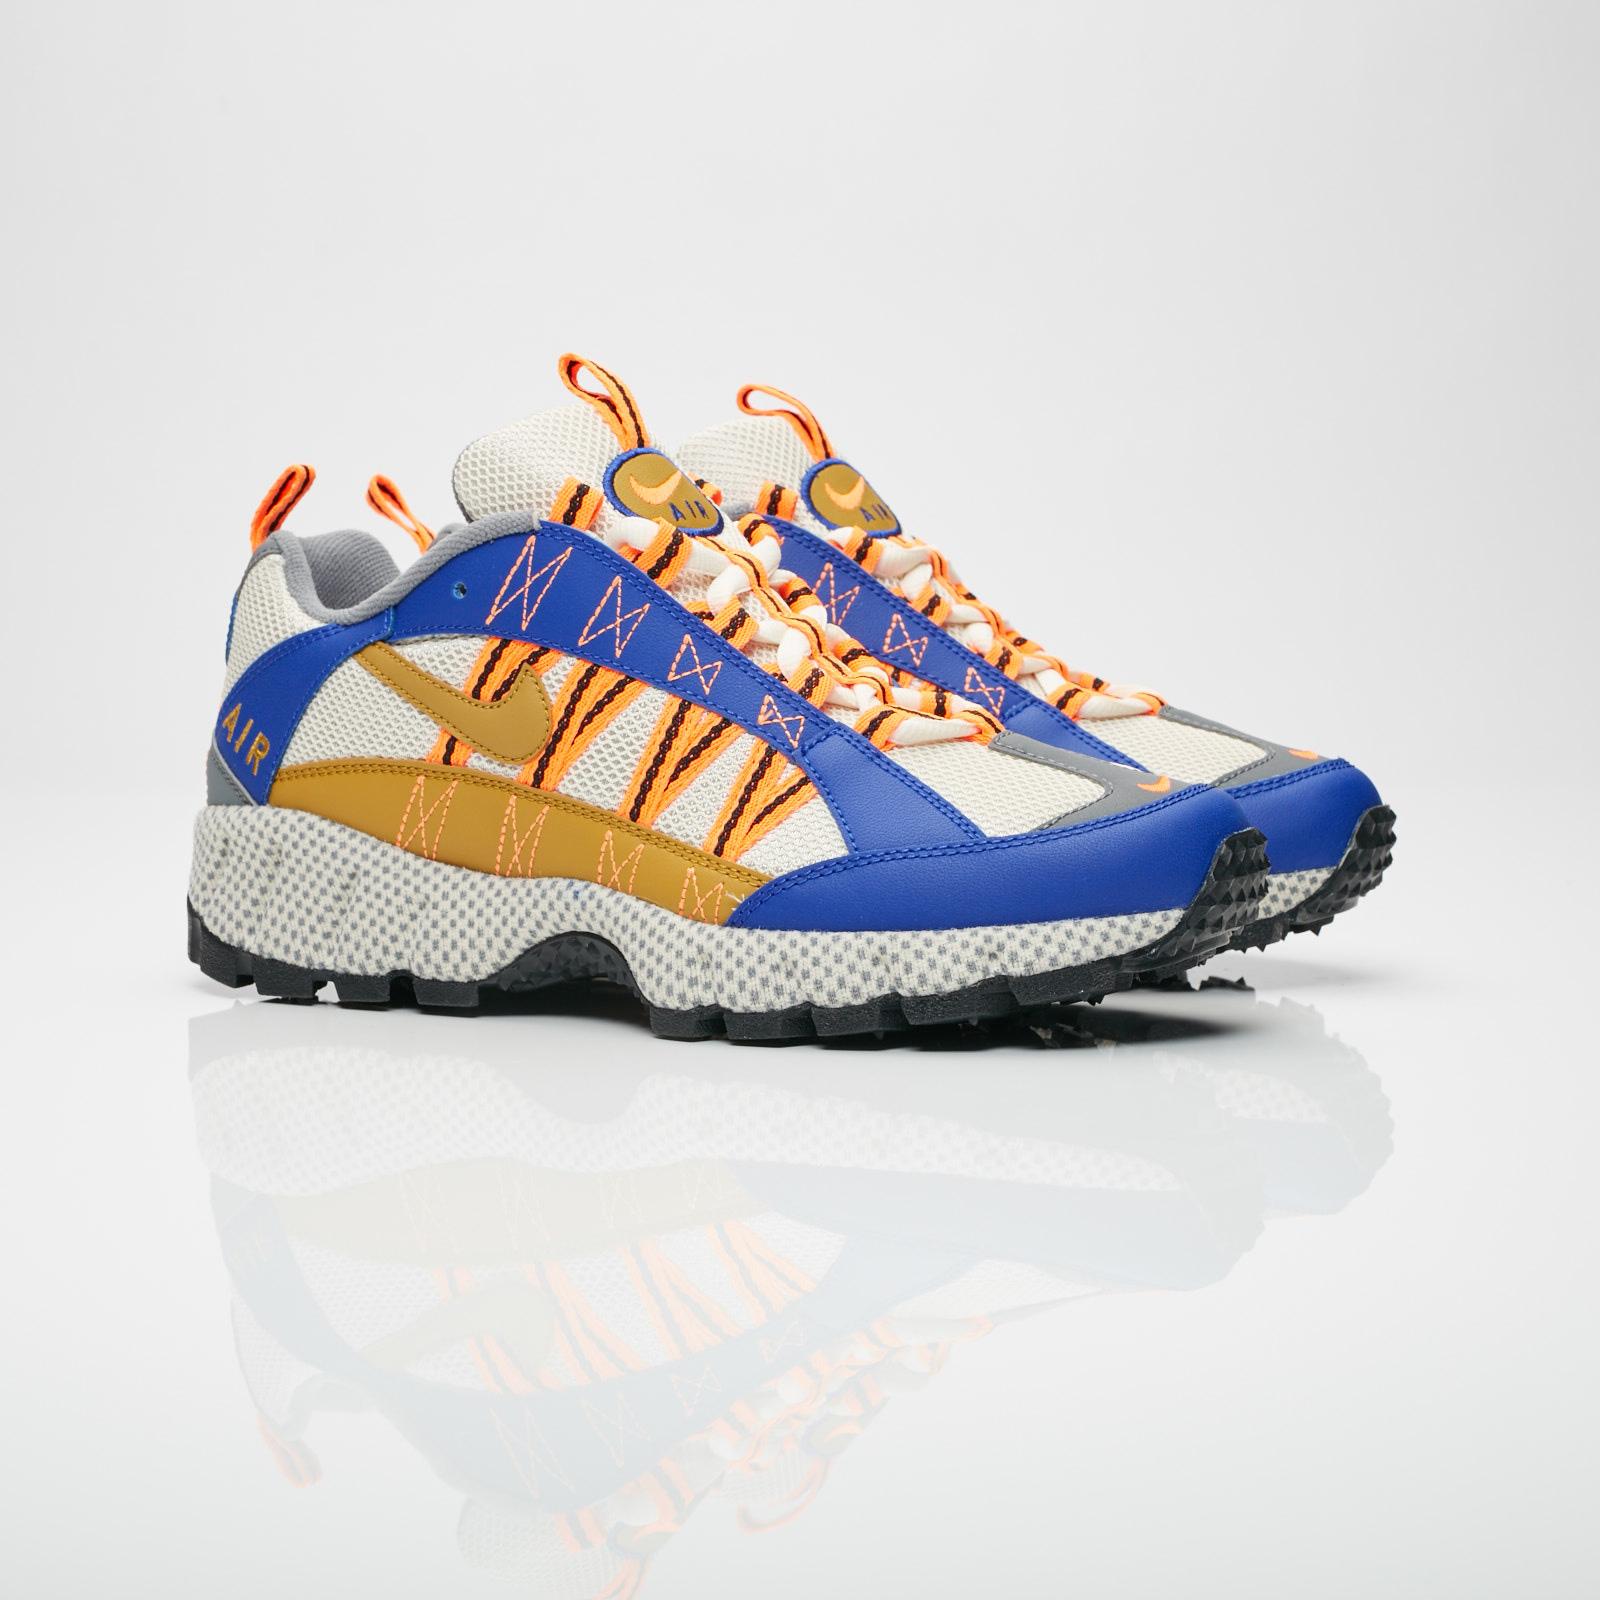 low priced a5bb7 0586f Nike Sportswear Air Humara 17 QS